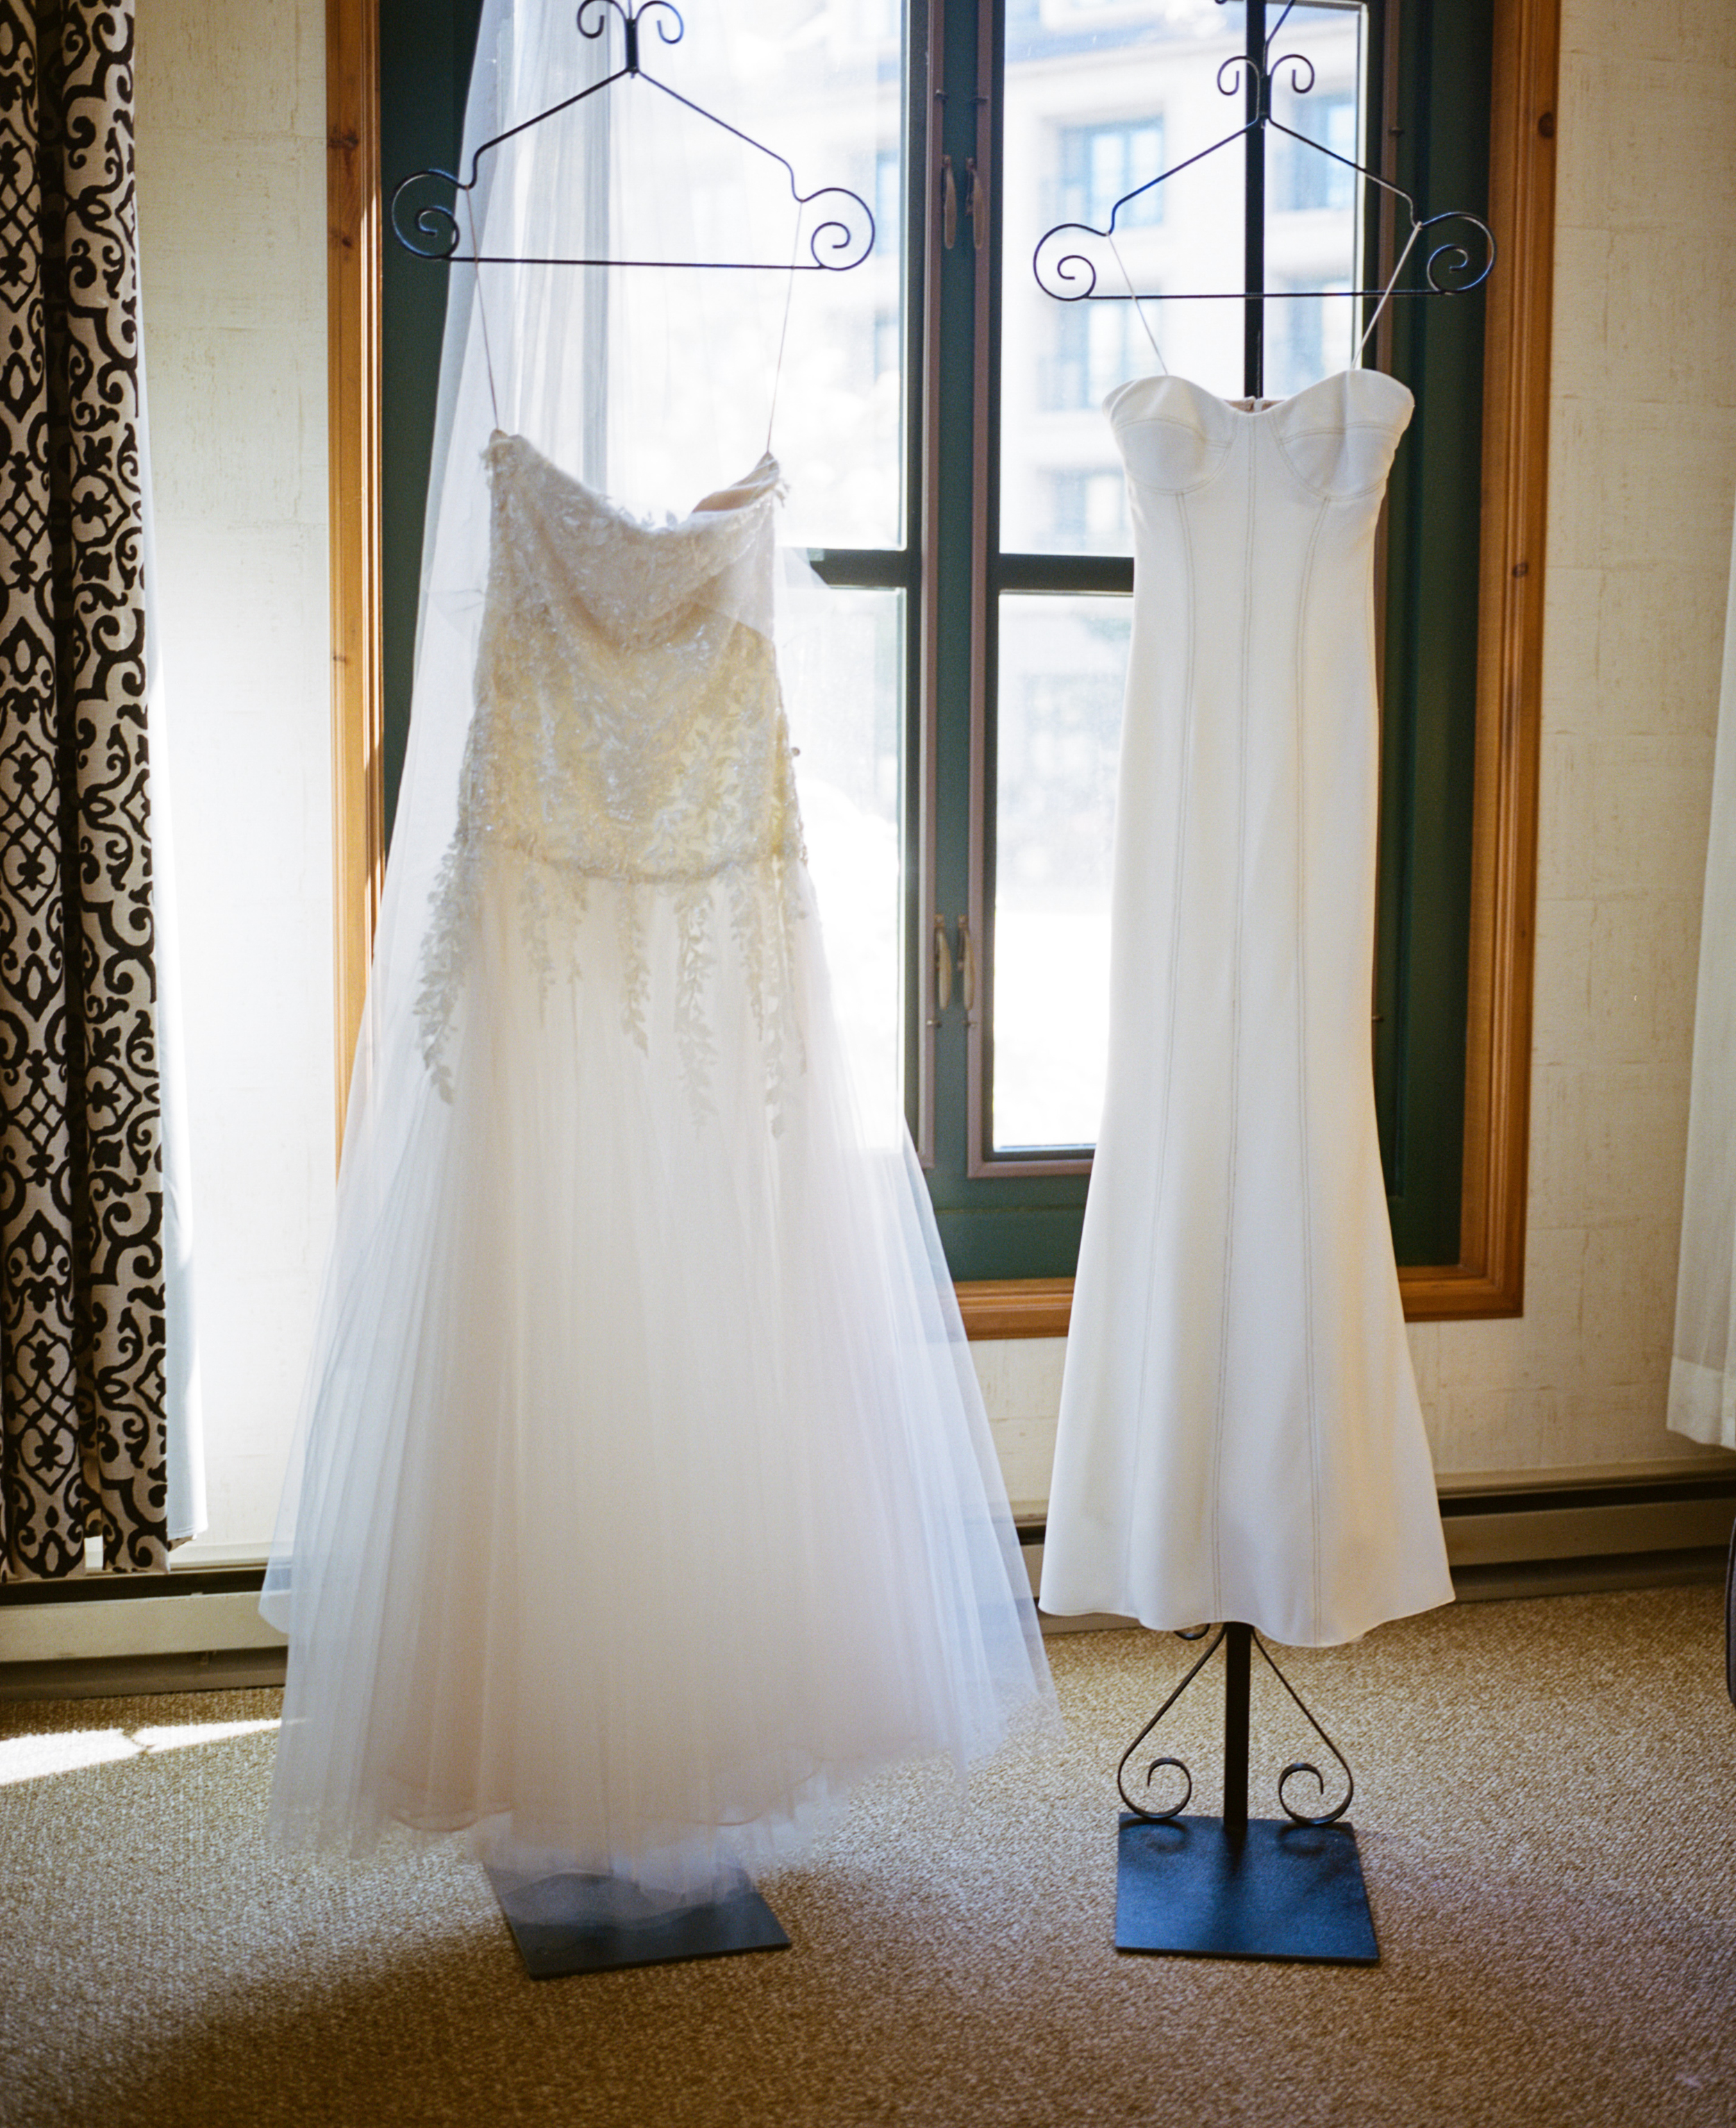 Kelly + Josh   Fall wedding at the Park Hyatt Beaver Creek   Dresses by Reem Acra and Rivini from Little White Dress   Ash Imagery